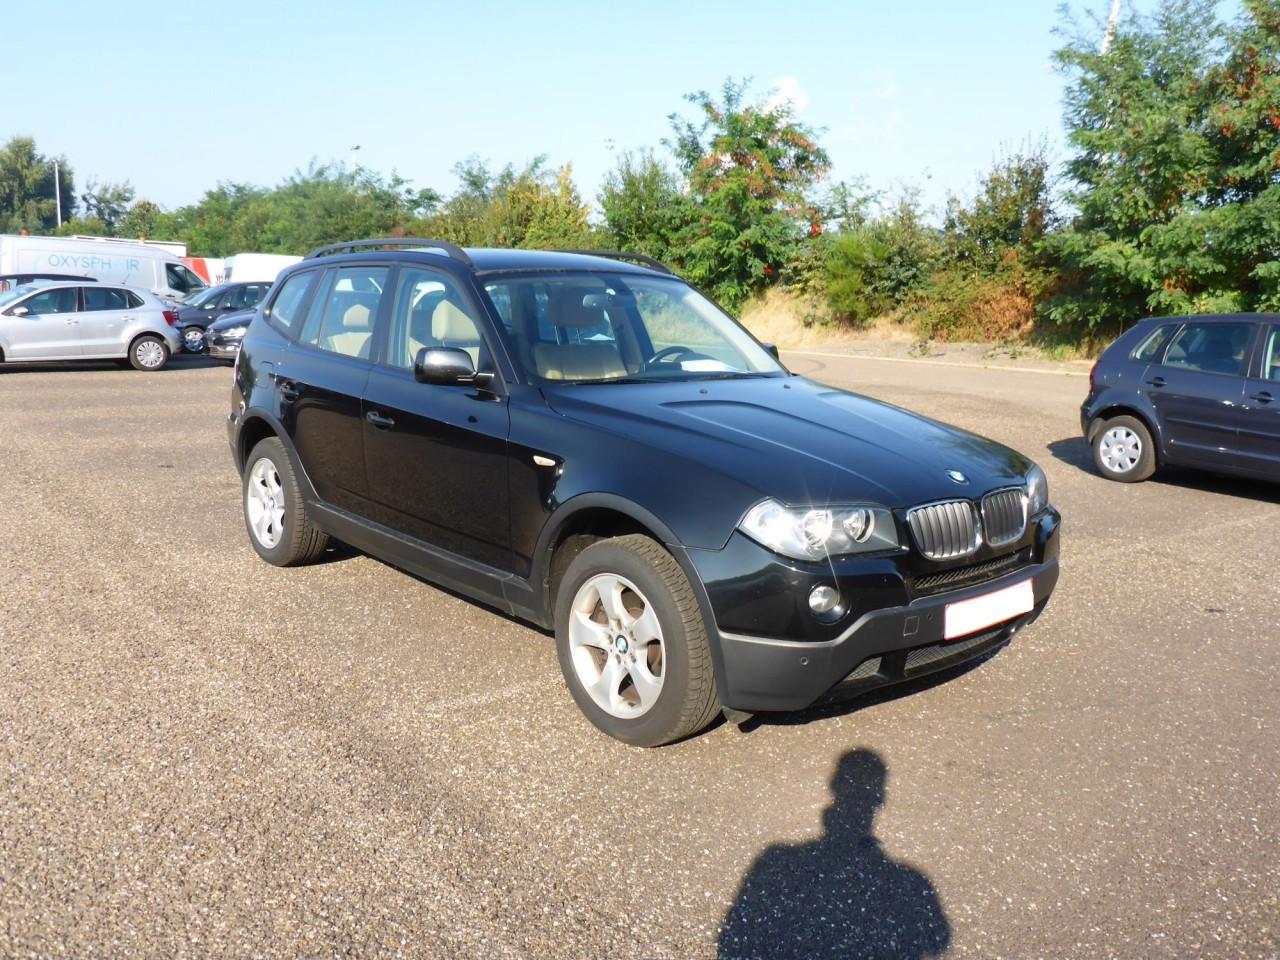 BMW X3 2.0d 2009